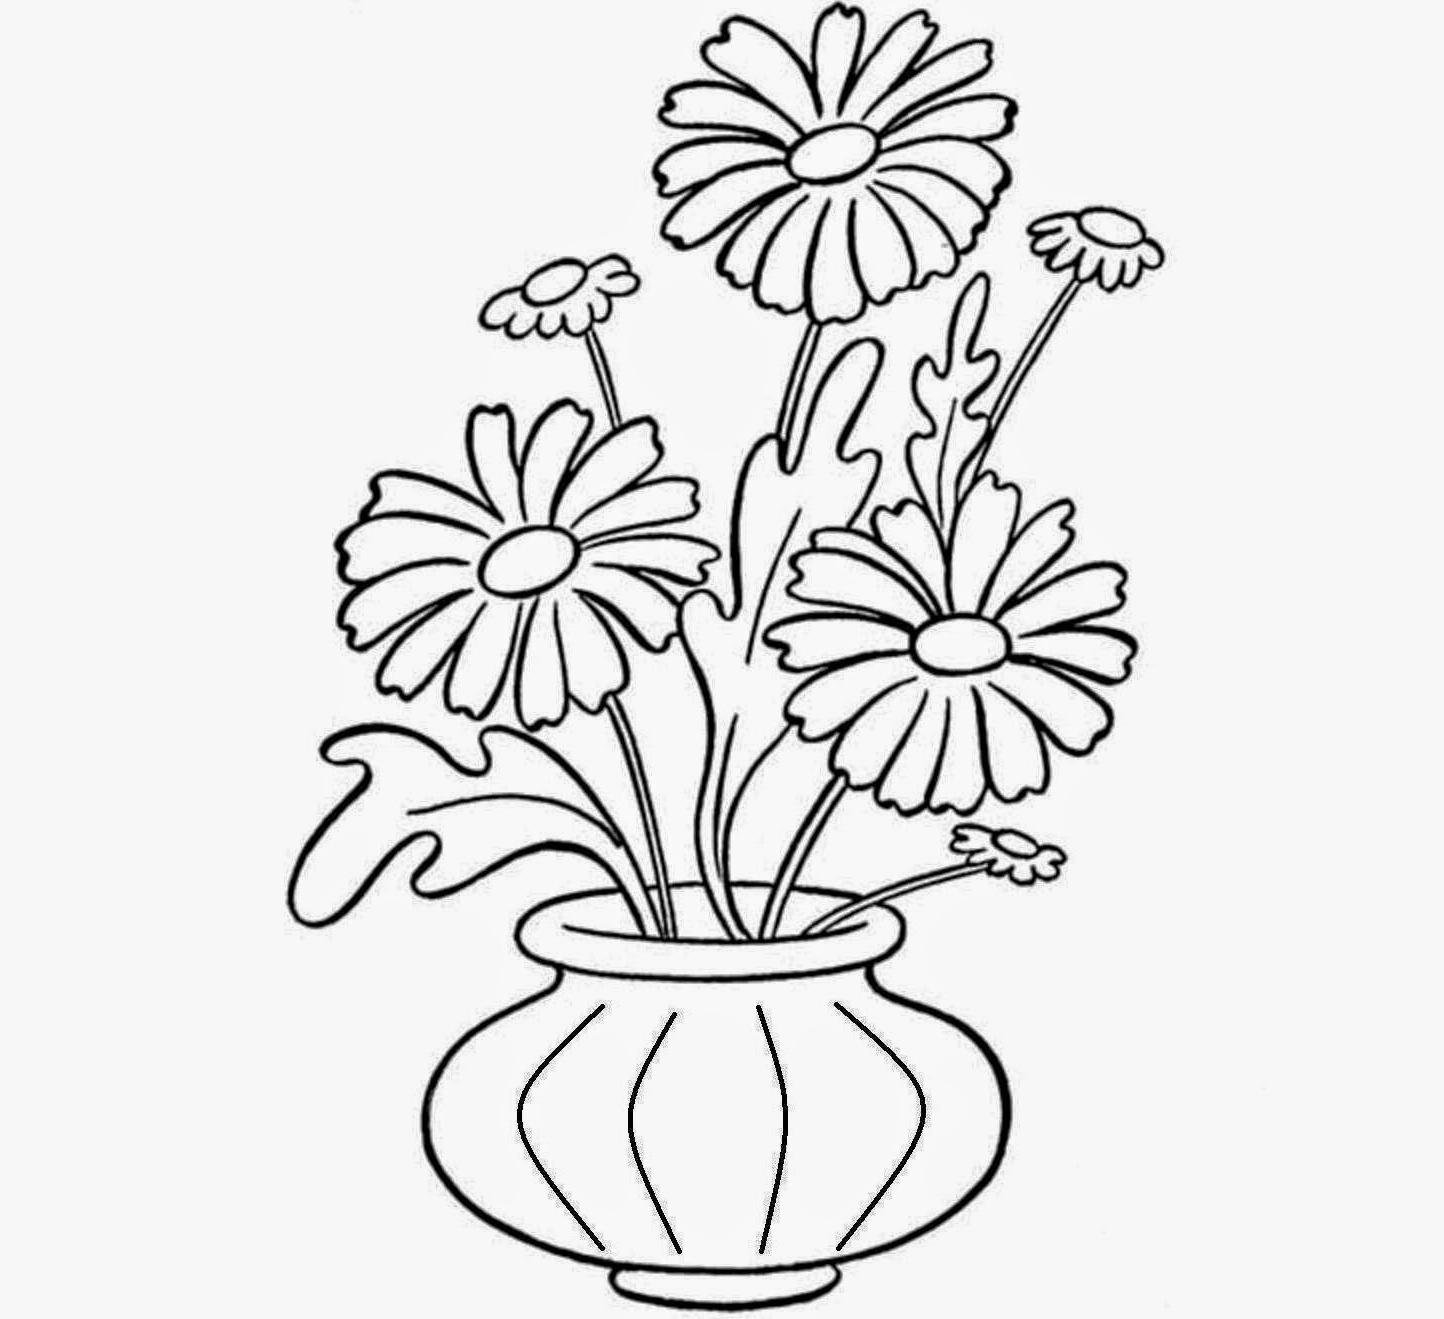 1444x1319 Pencil Sketch Of Flower Vase Easy Pencil Sketch Of Flower Vase